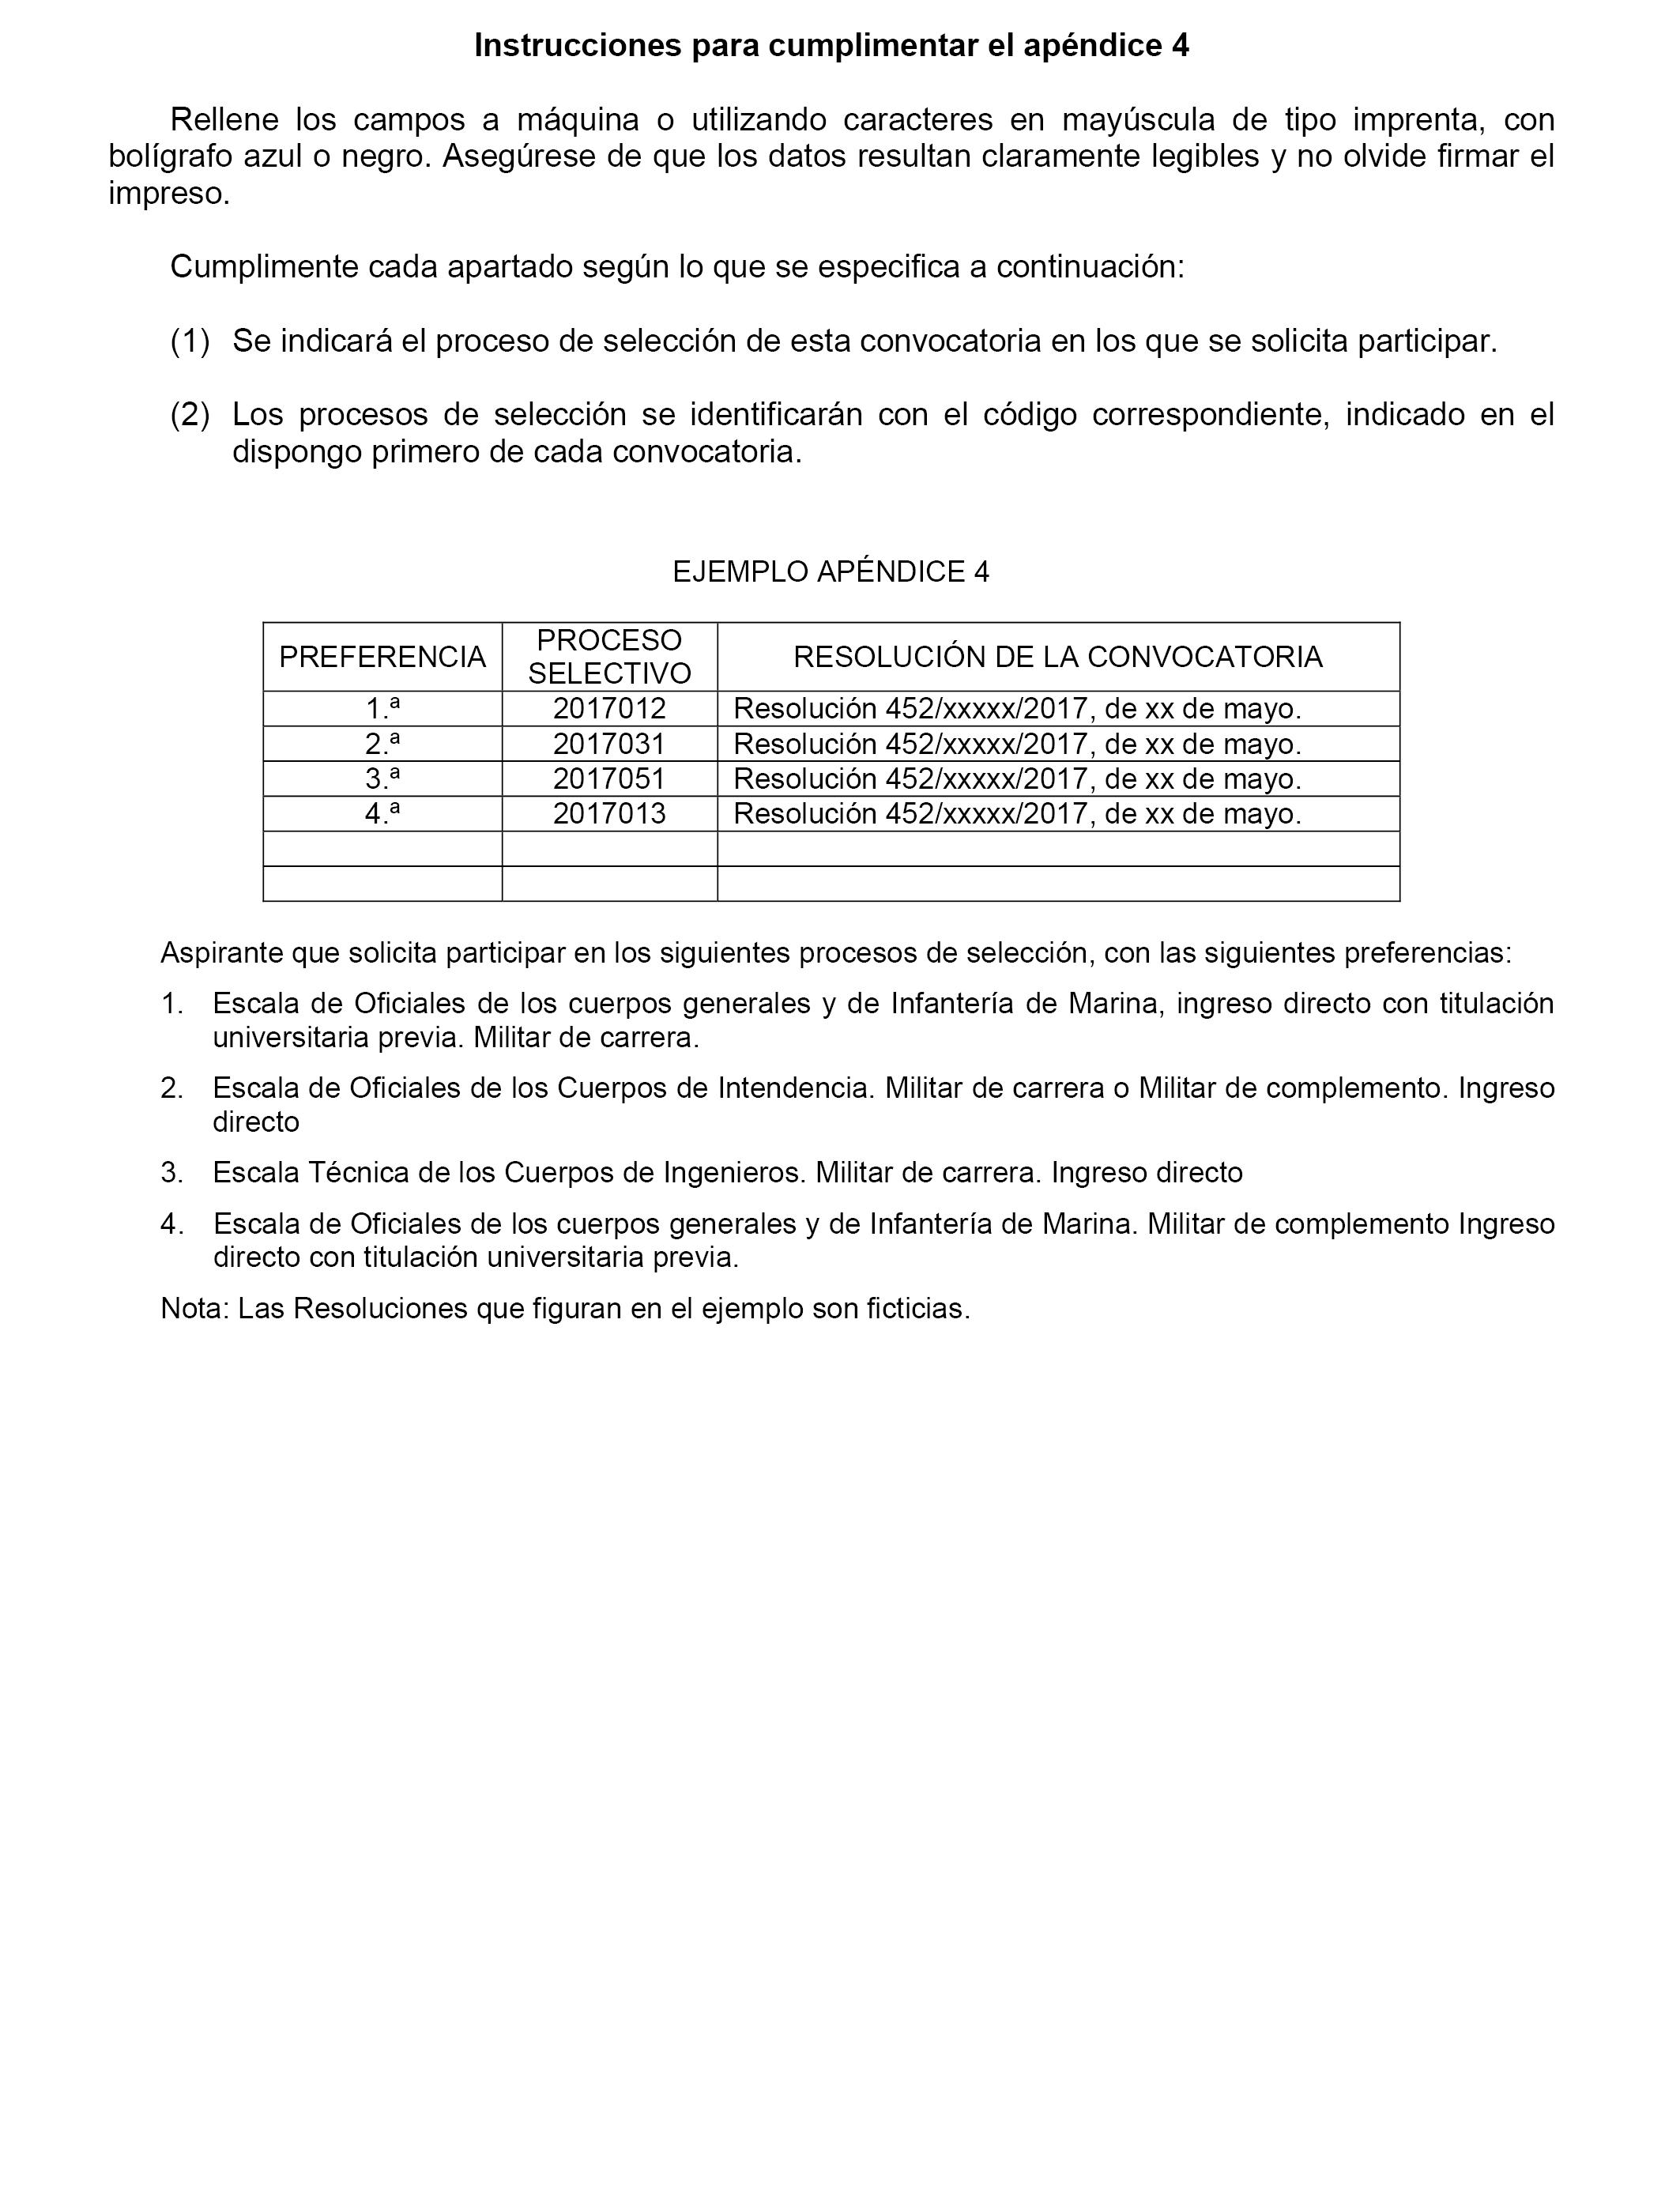 BOE.es - Documento BOE-A-2017-5914